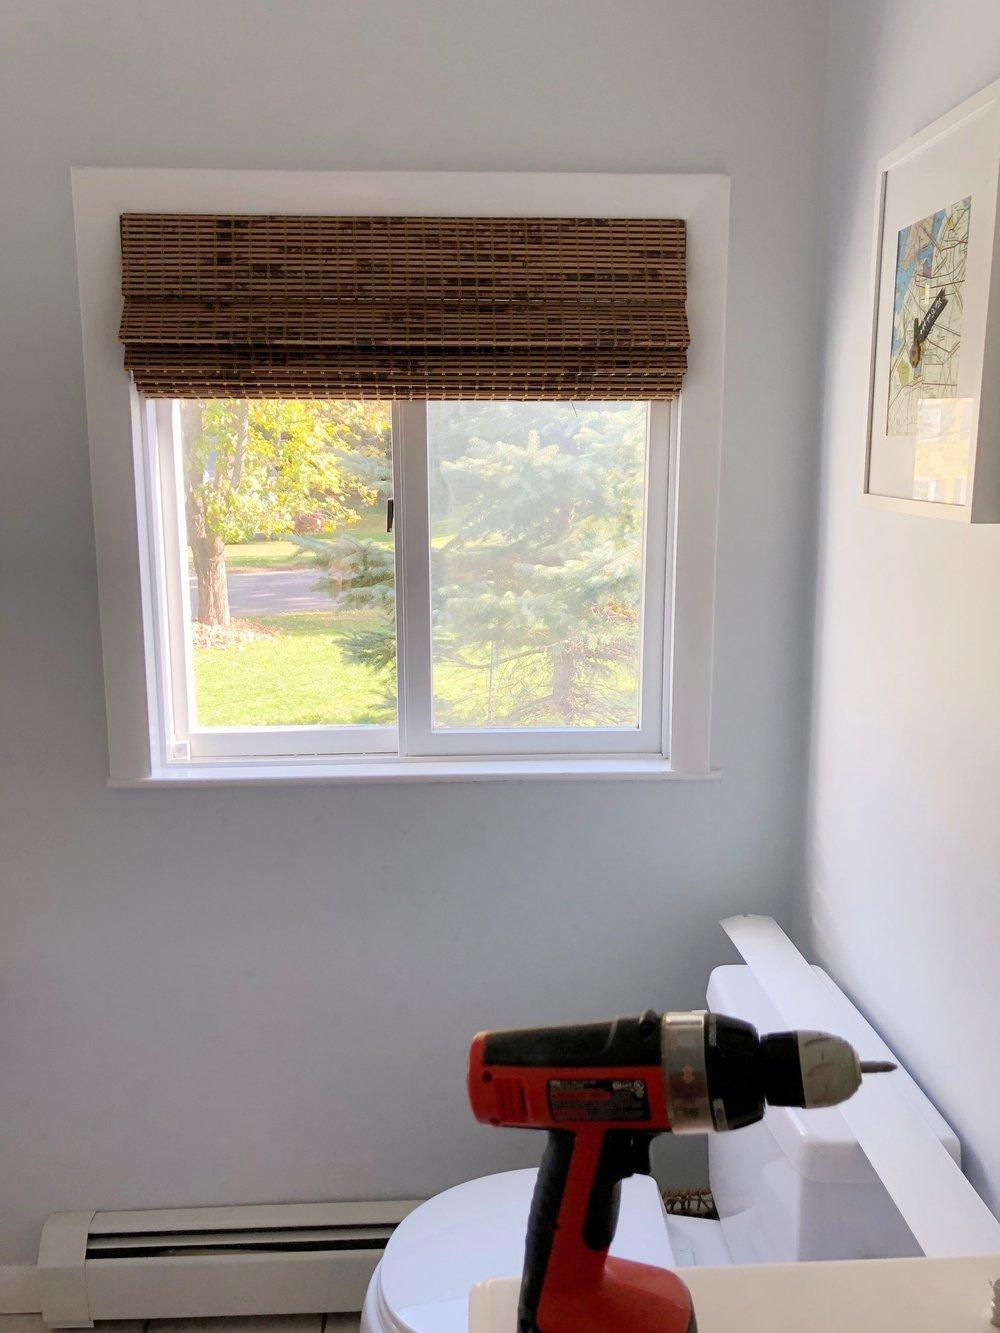 Gray Oak Studio - 2 Days 200 Dollars - Window Treatment Transformation